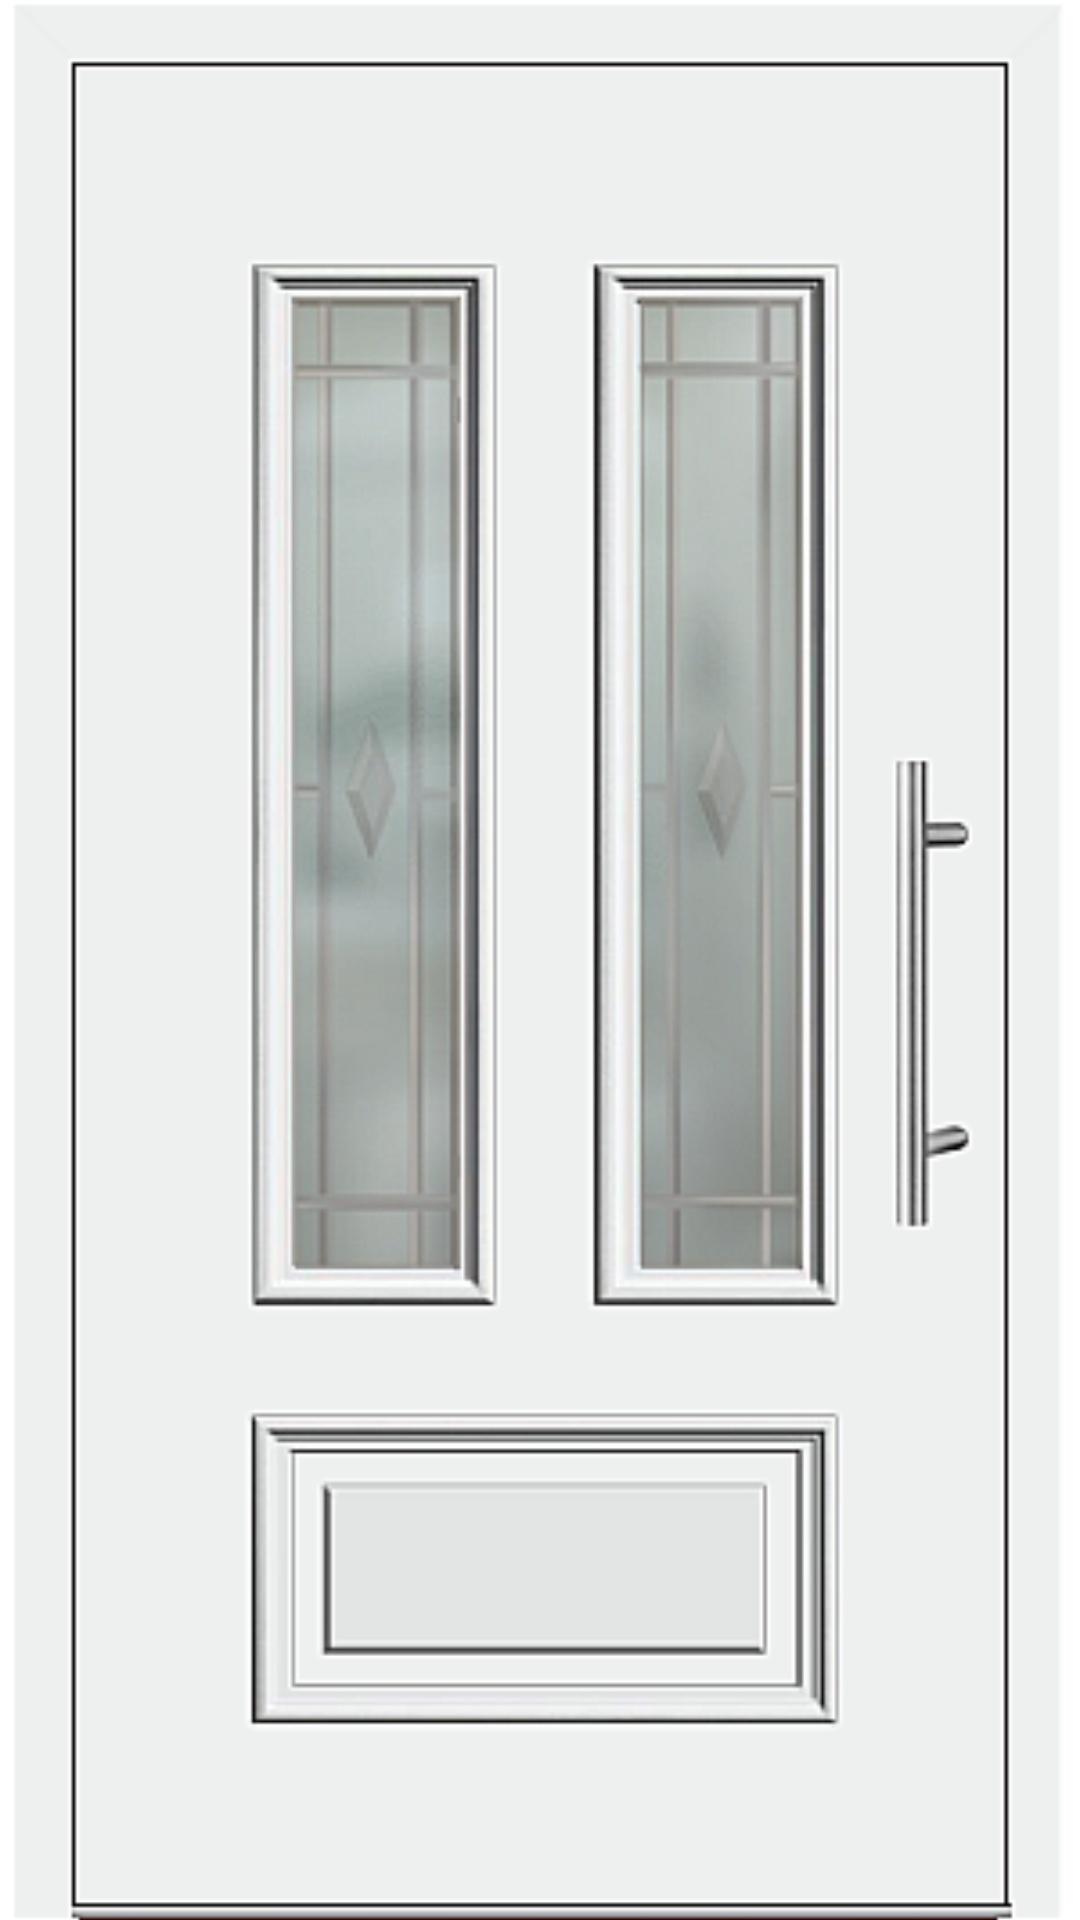 Aluminium Haustür Modell 6547-10 weiß